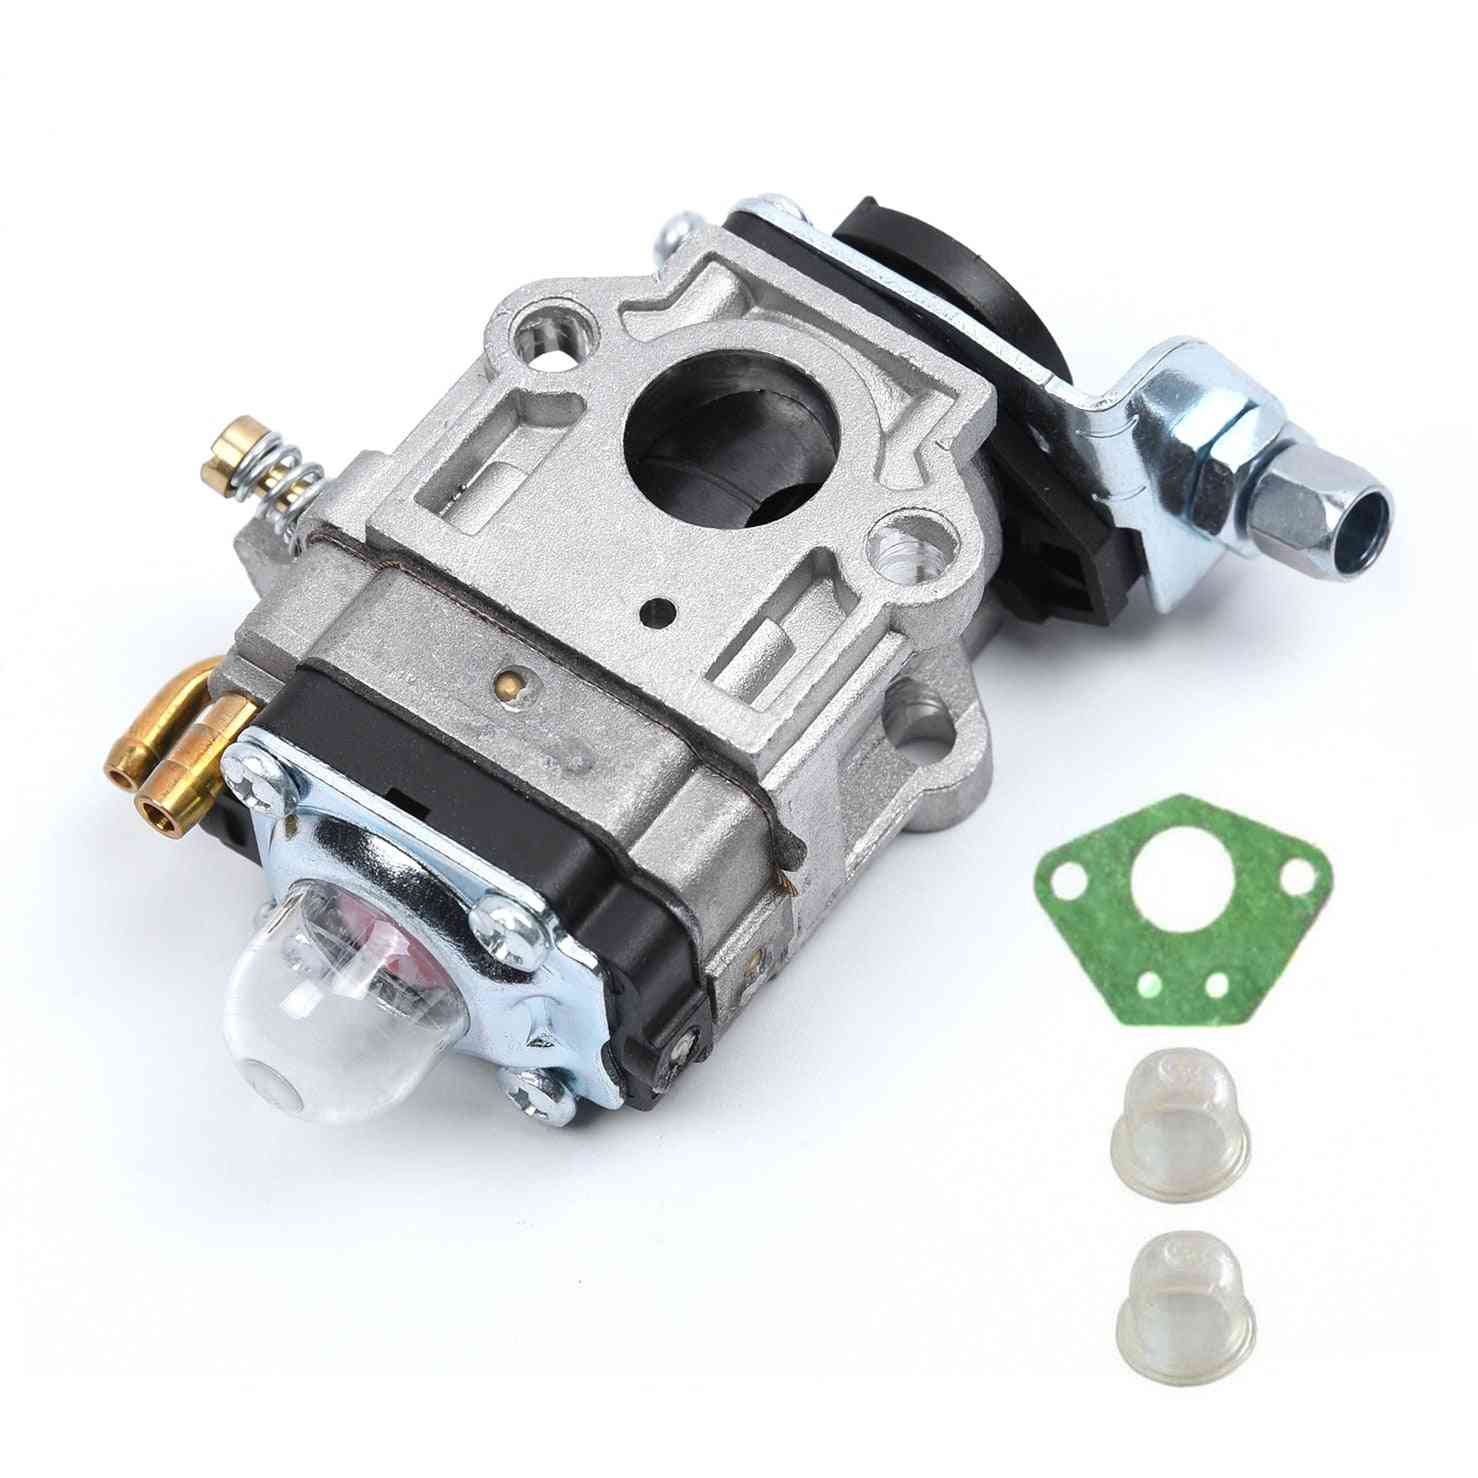 Carburetor Kit For Brush Cutter 43cc/49cc/52cc